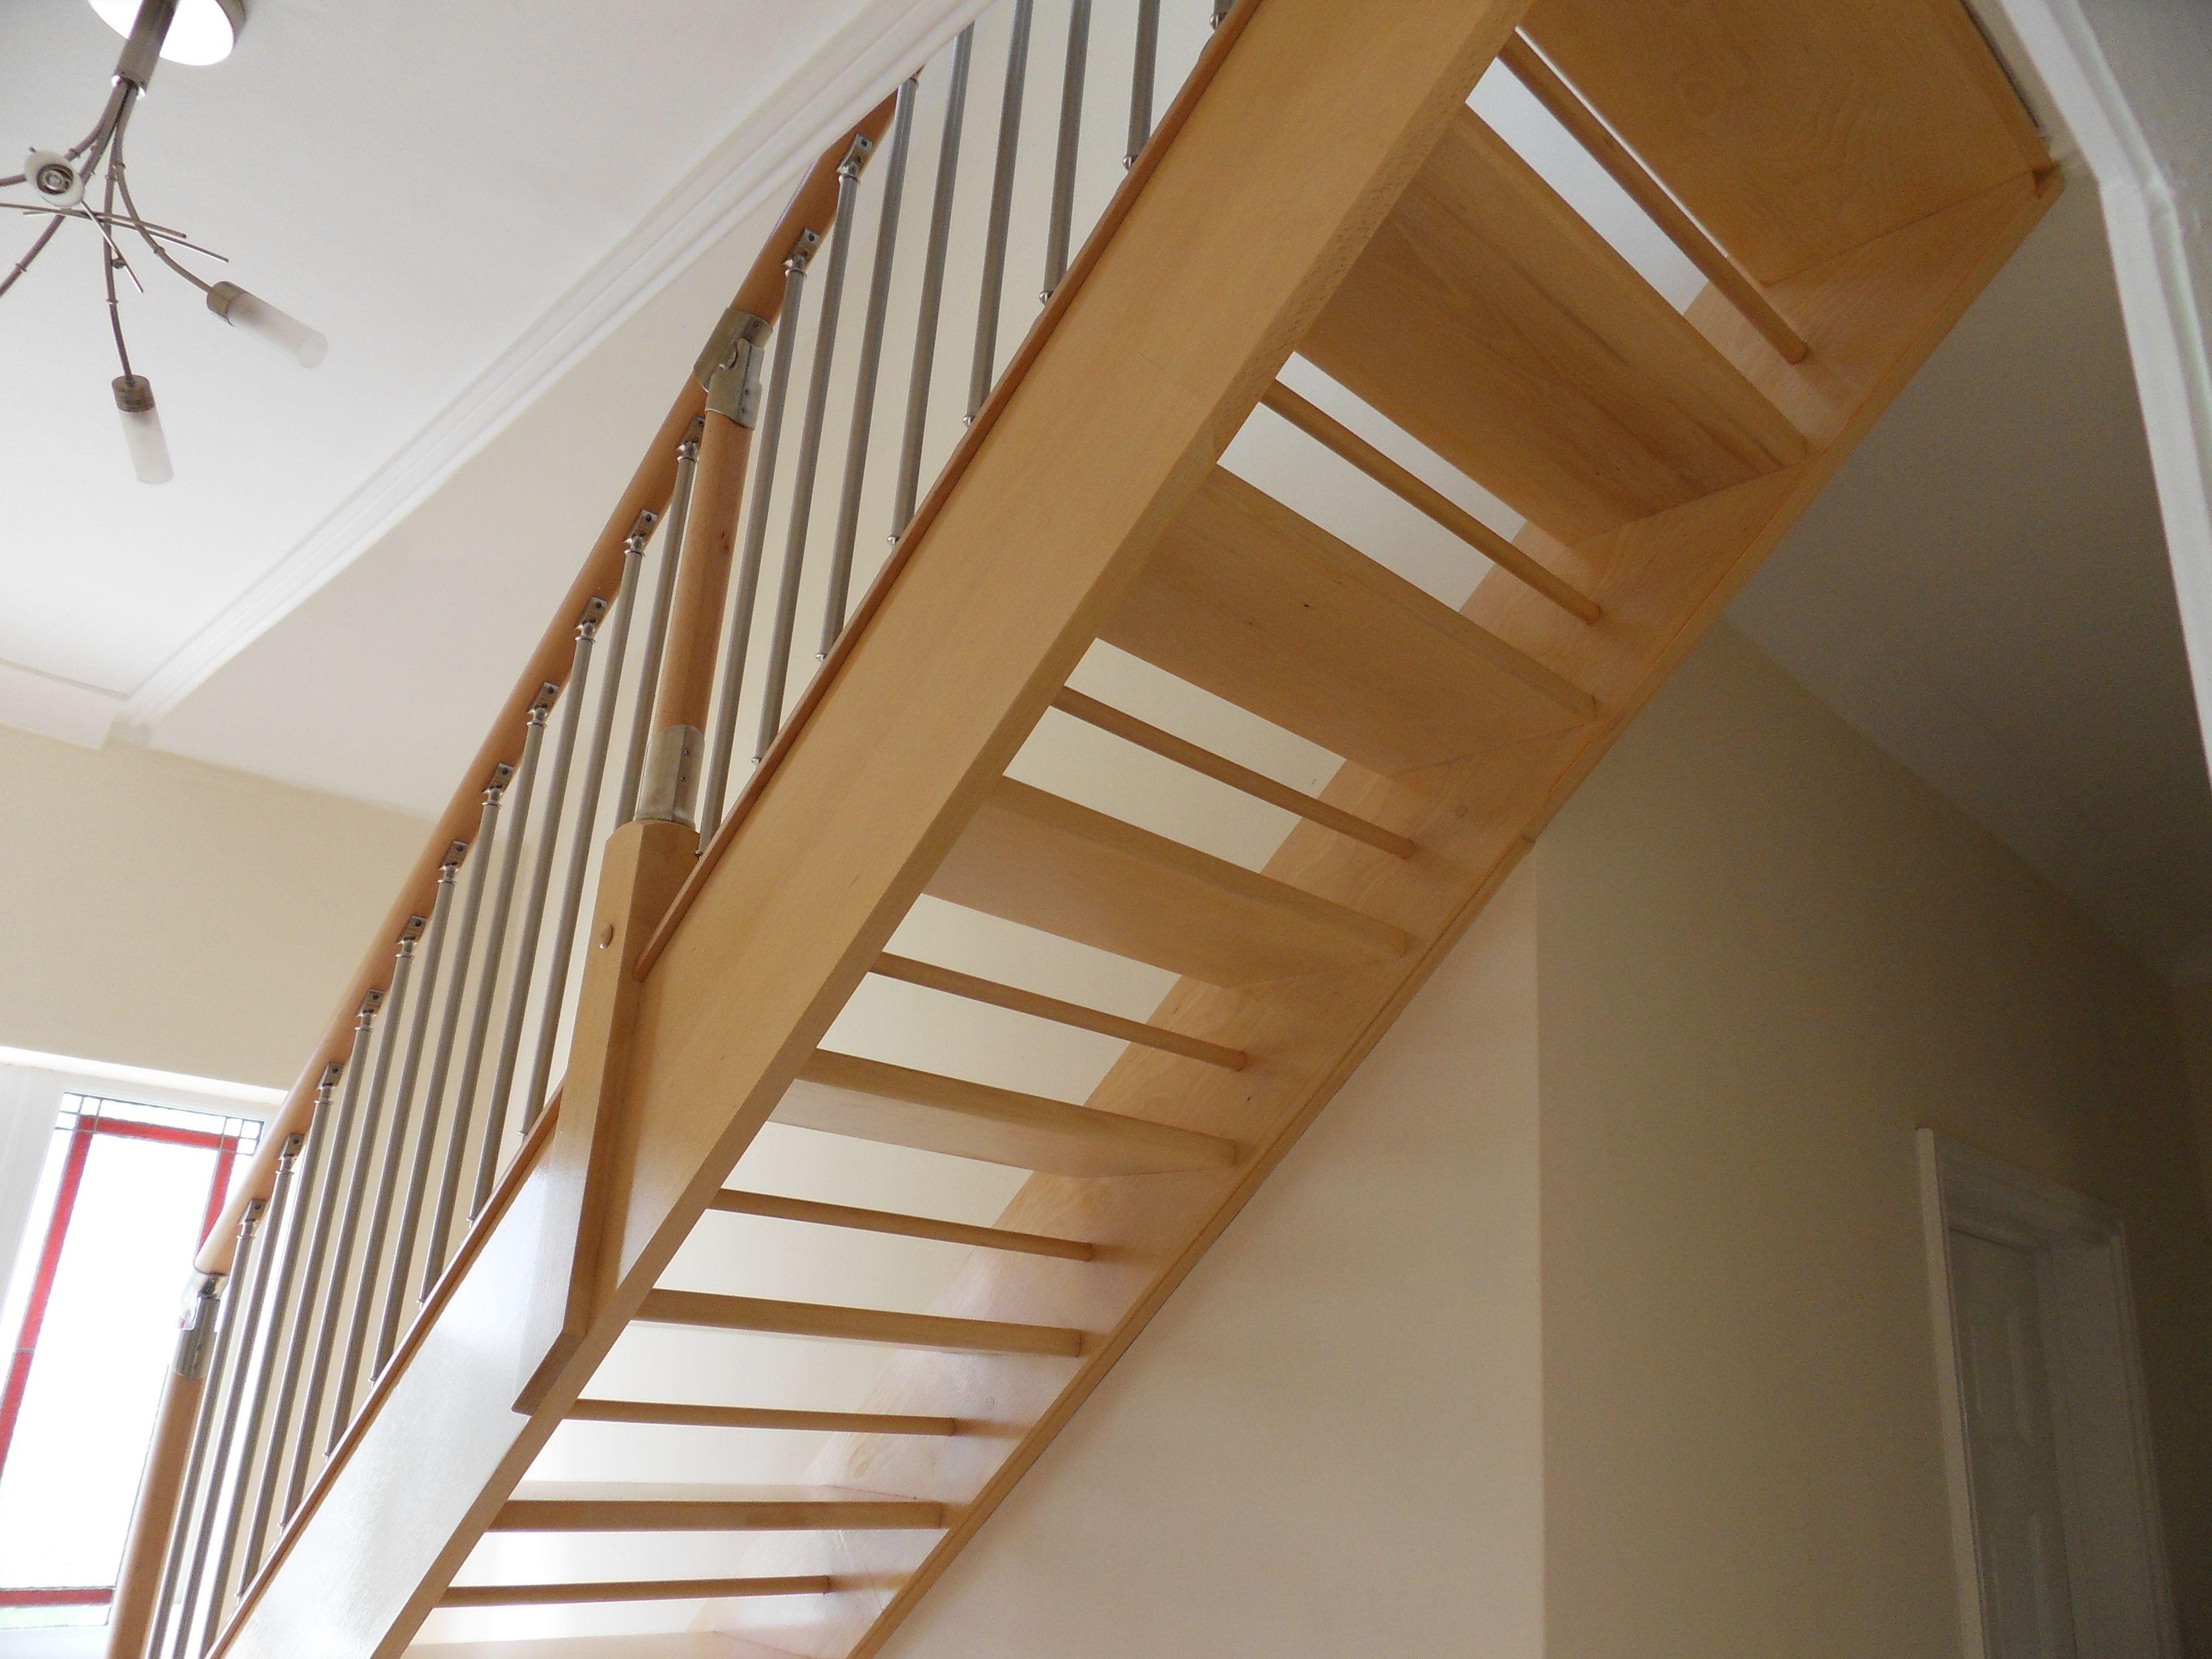 14 Unutterable Attic Bedroom Regulations Ideas In 2020 Attic Renovation Attic Remodel Attic Design